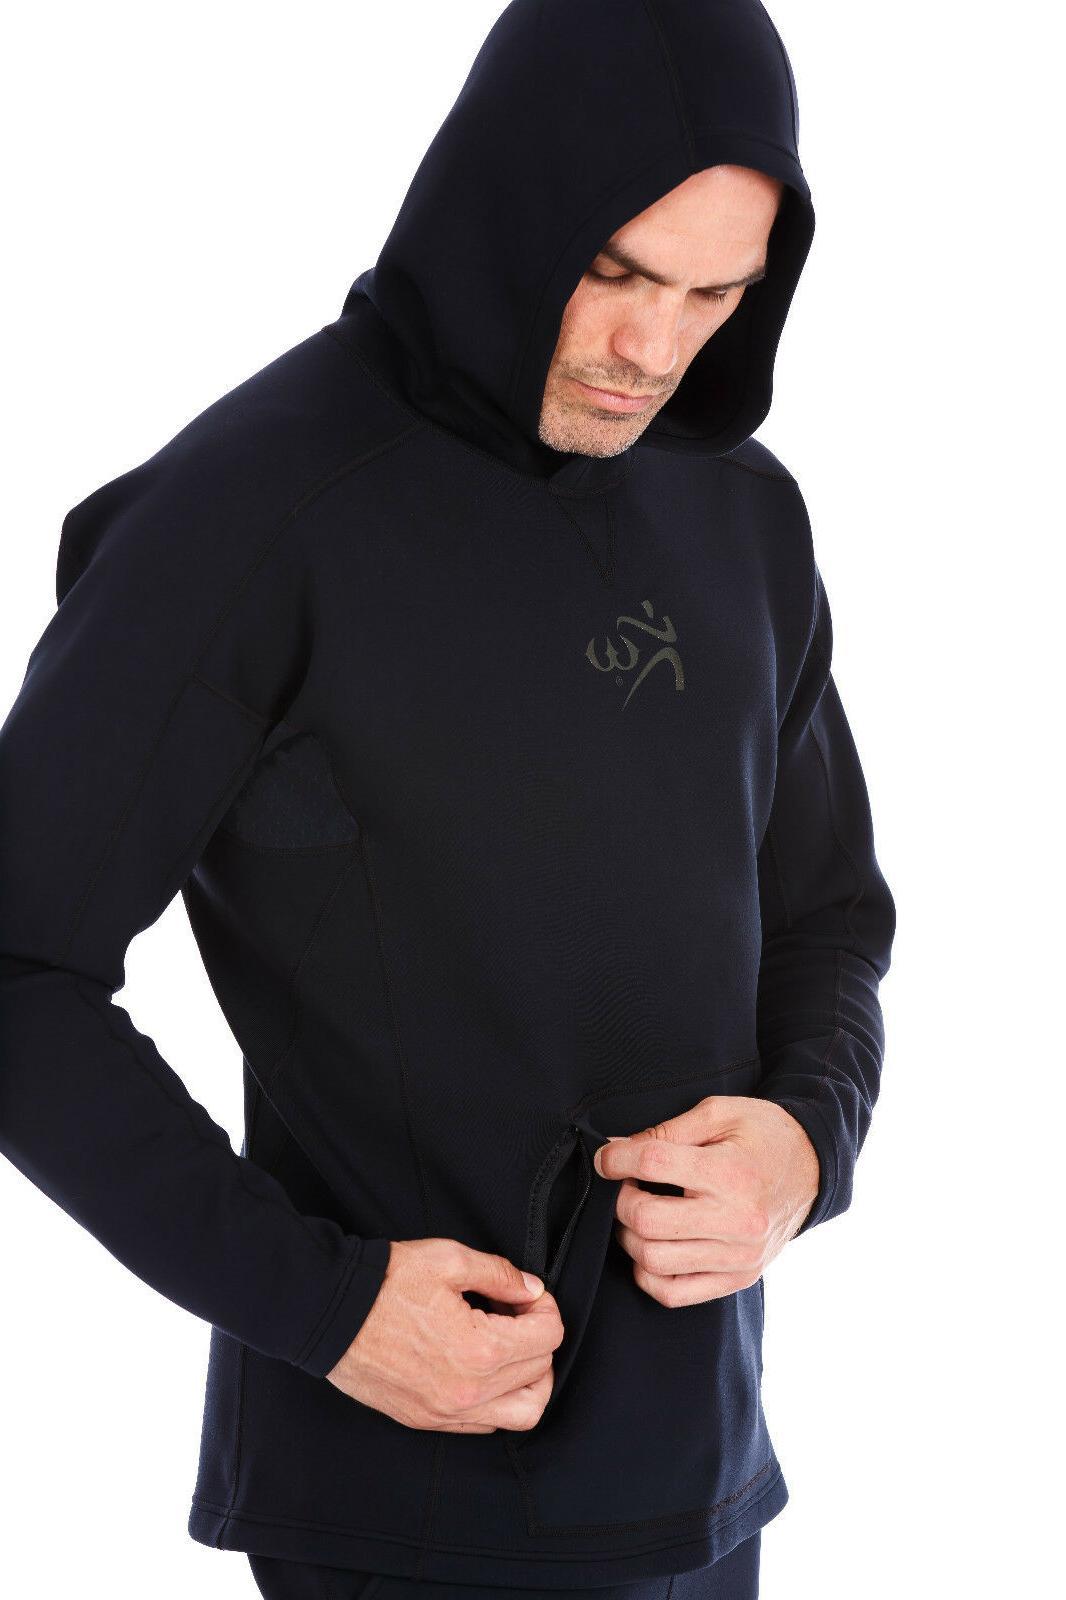 neoprene weight loss sauna suit all black